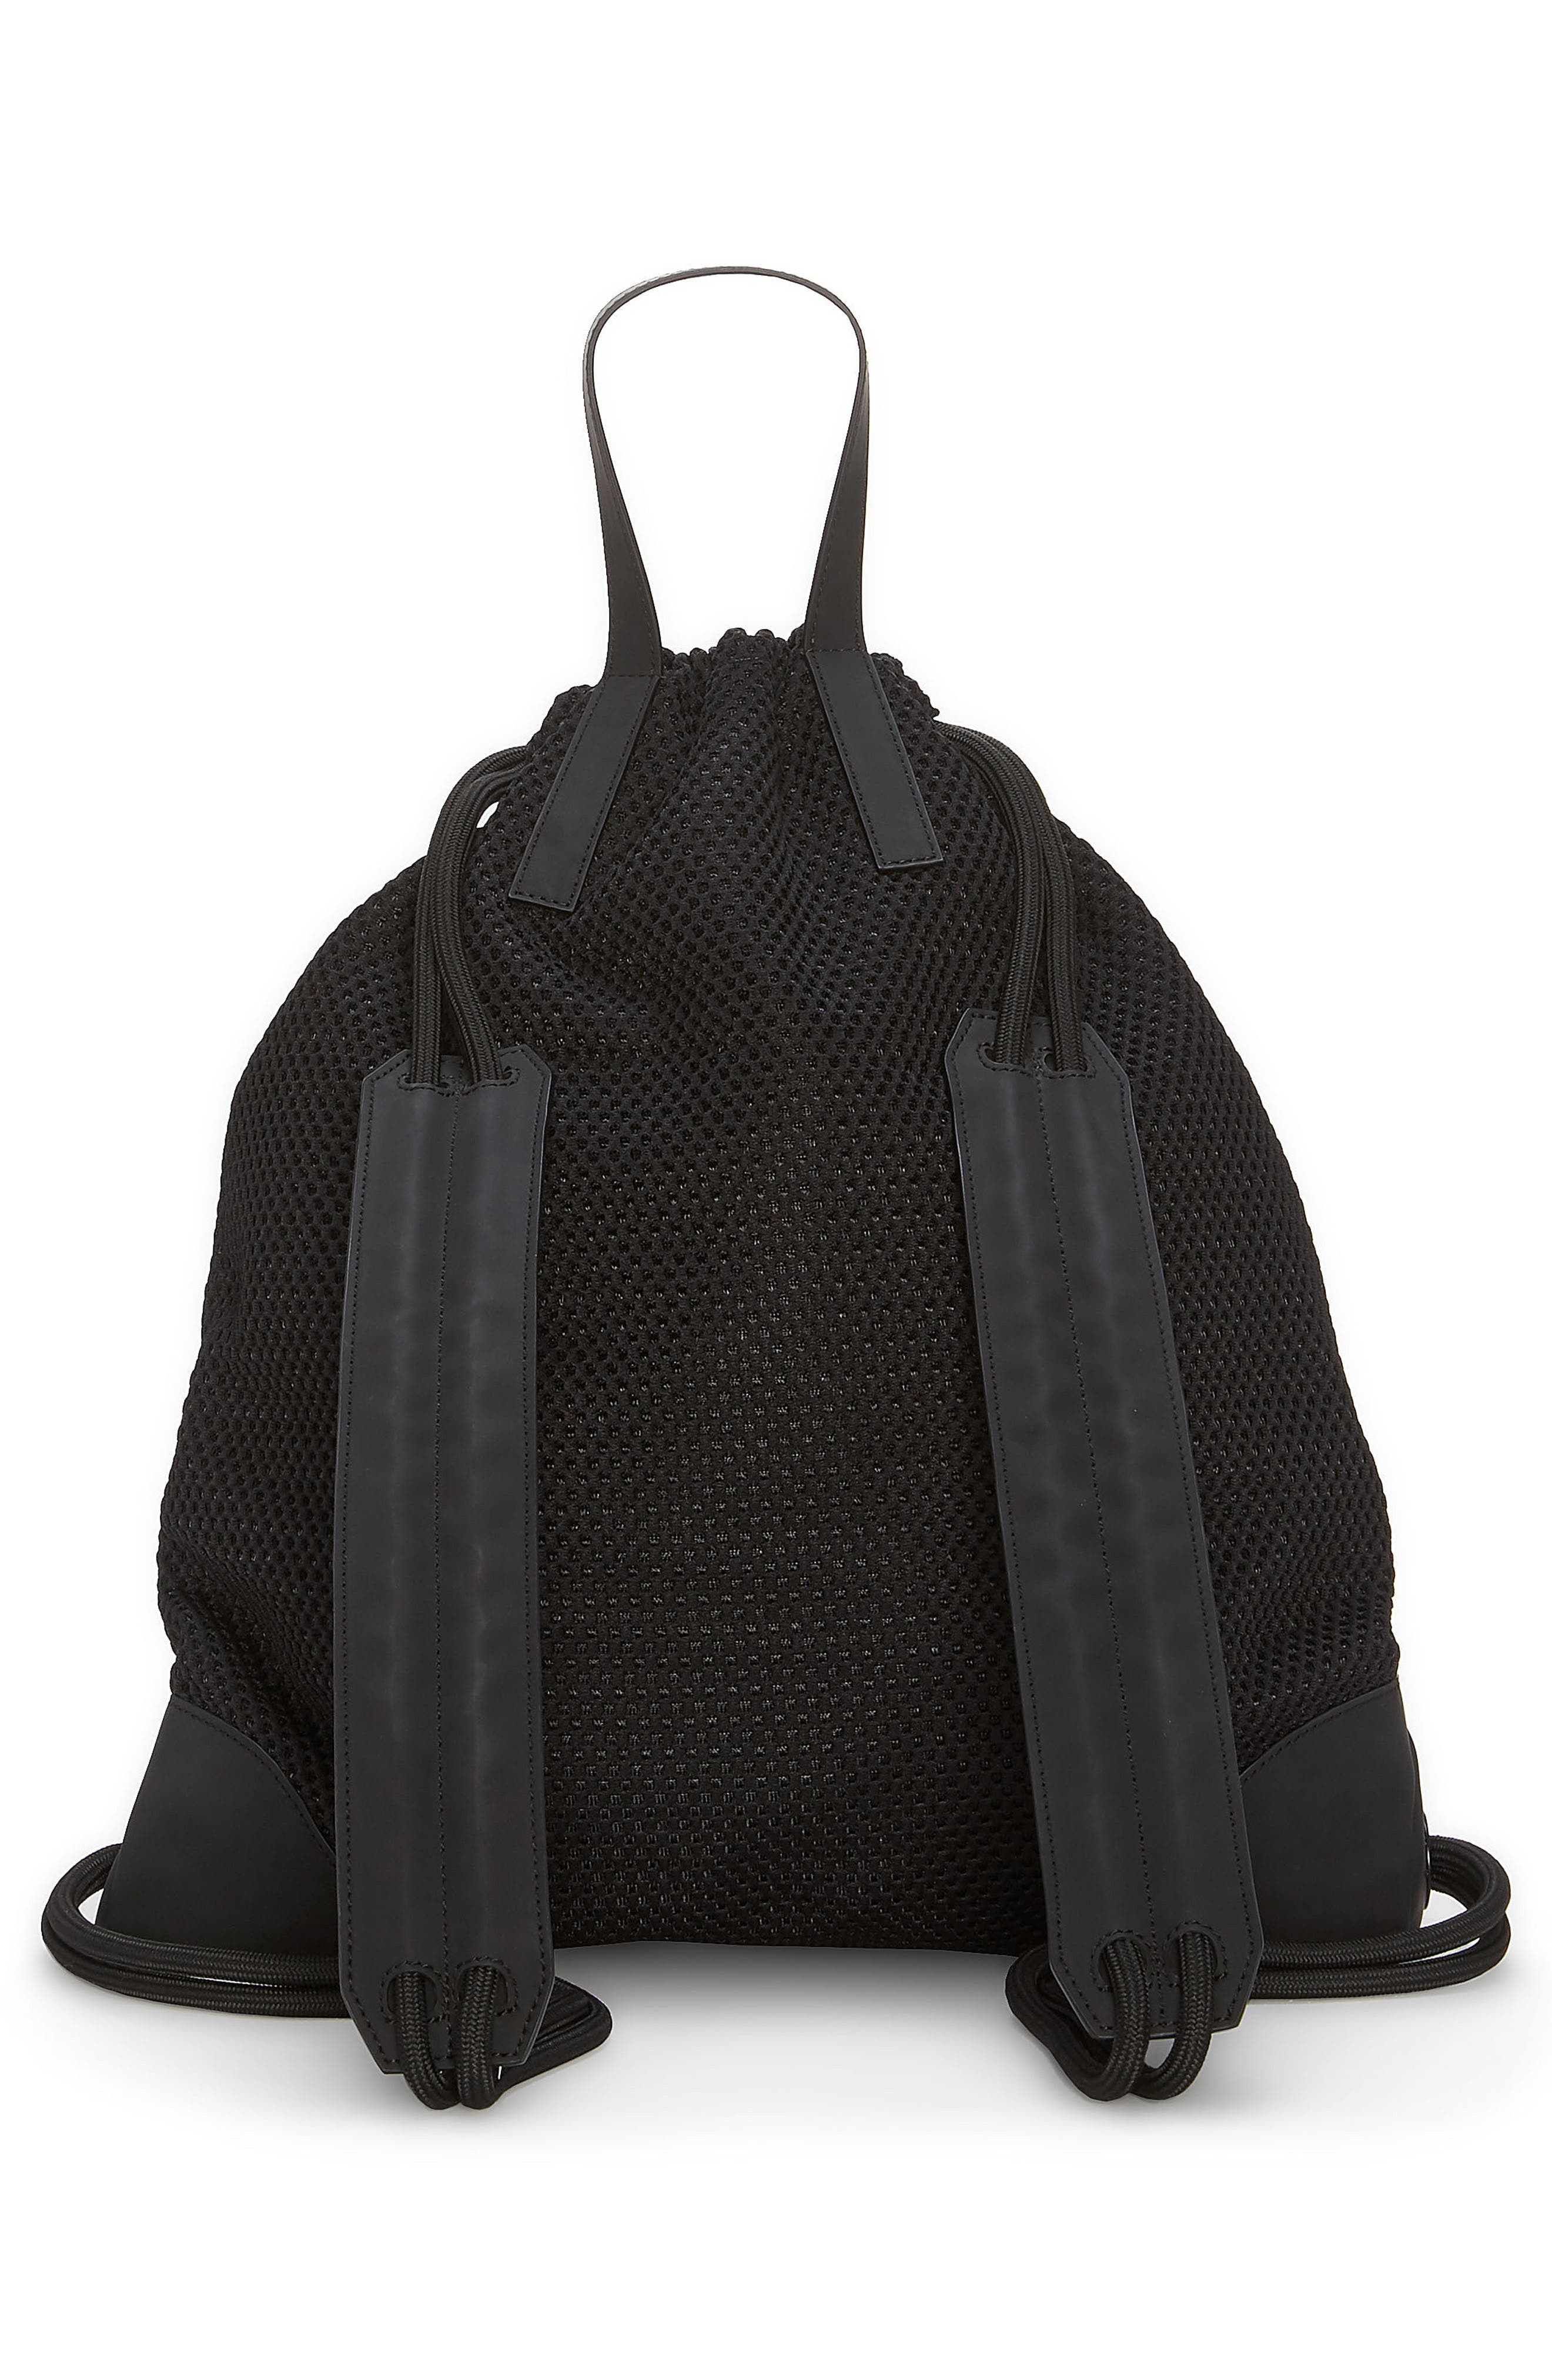 Urban Mesh Backpack,                             Alternate thumbnail 2, color,                             Black